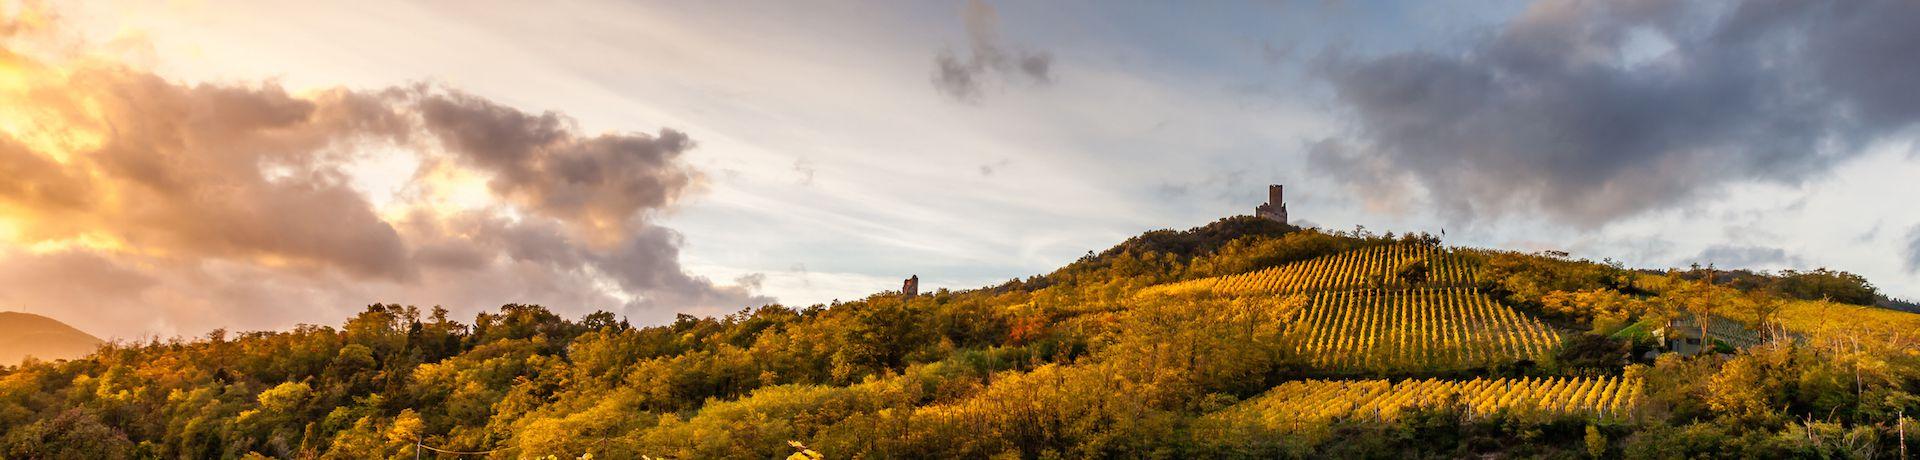 Supertrips - Luxe boomhut Zuid-Frankrijk